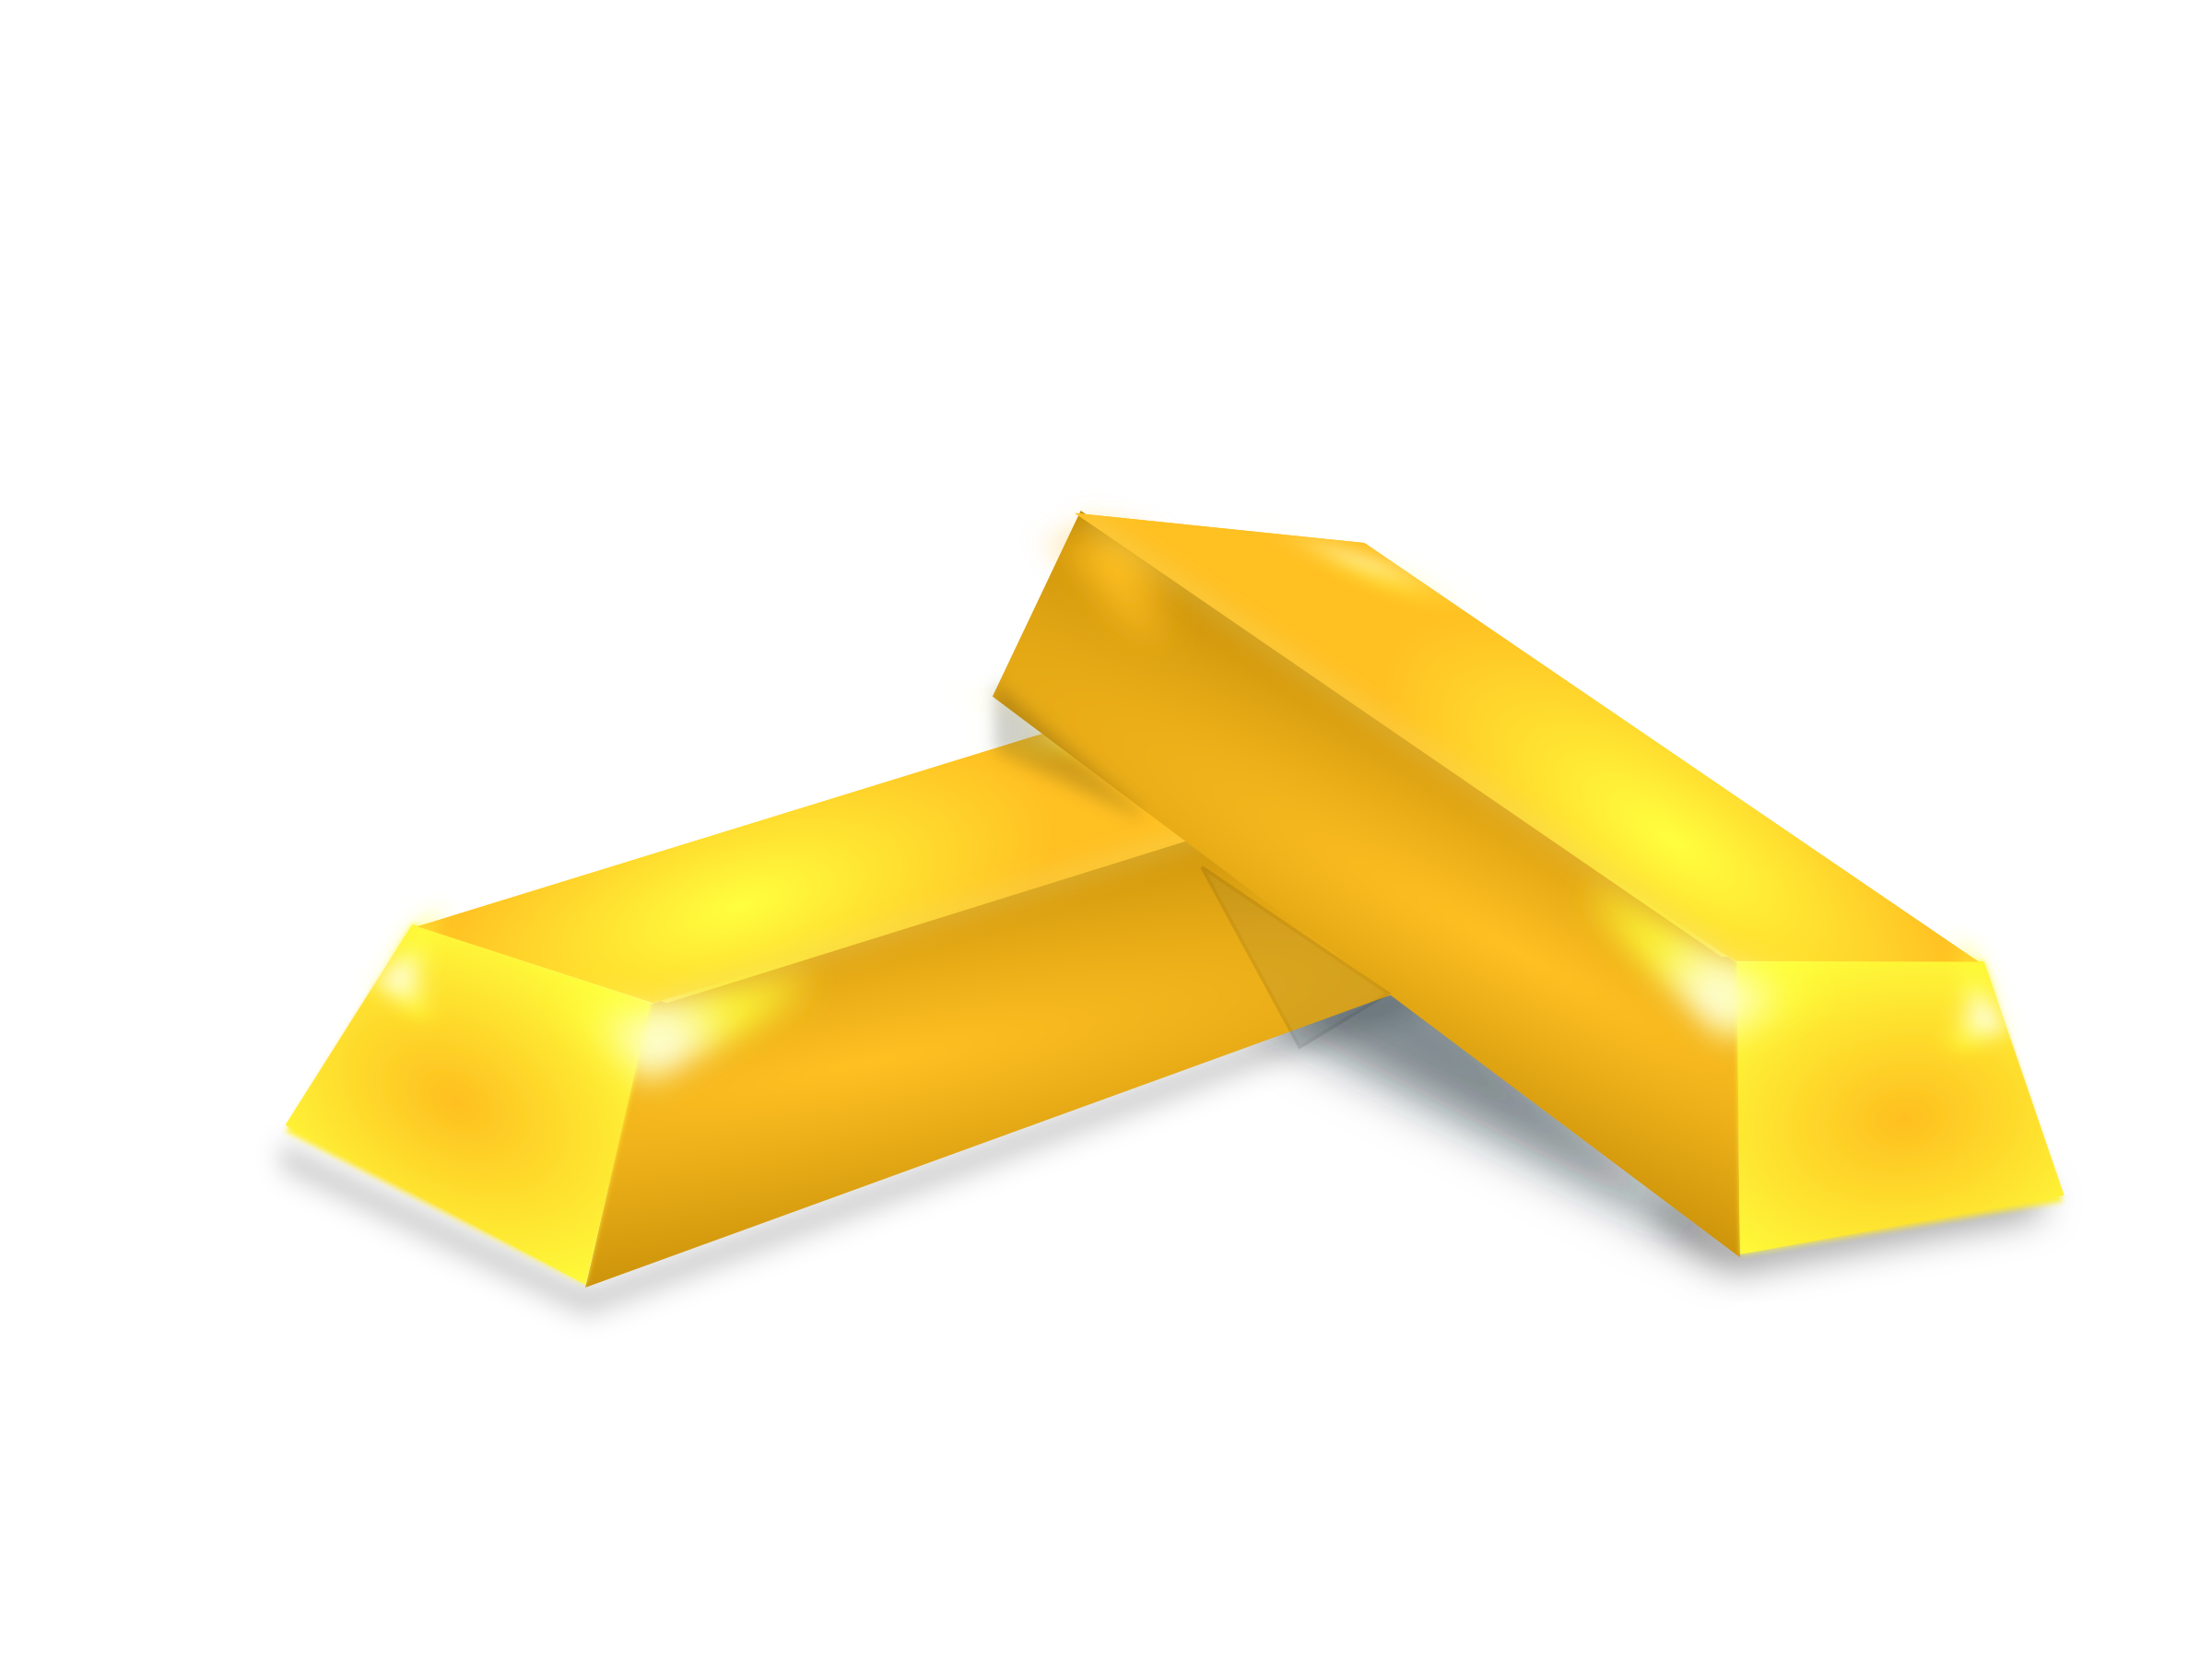 Gold clipart gold brick. Big image png